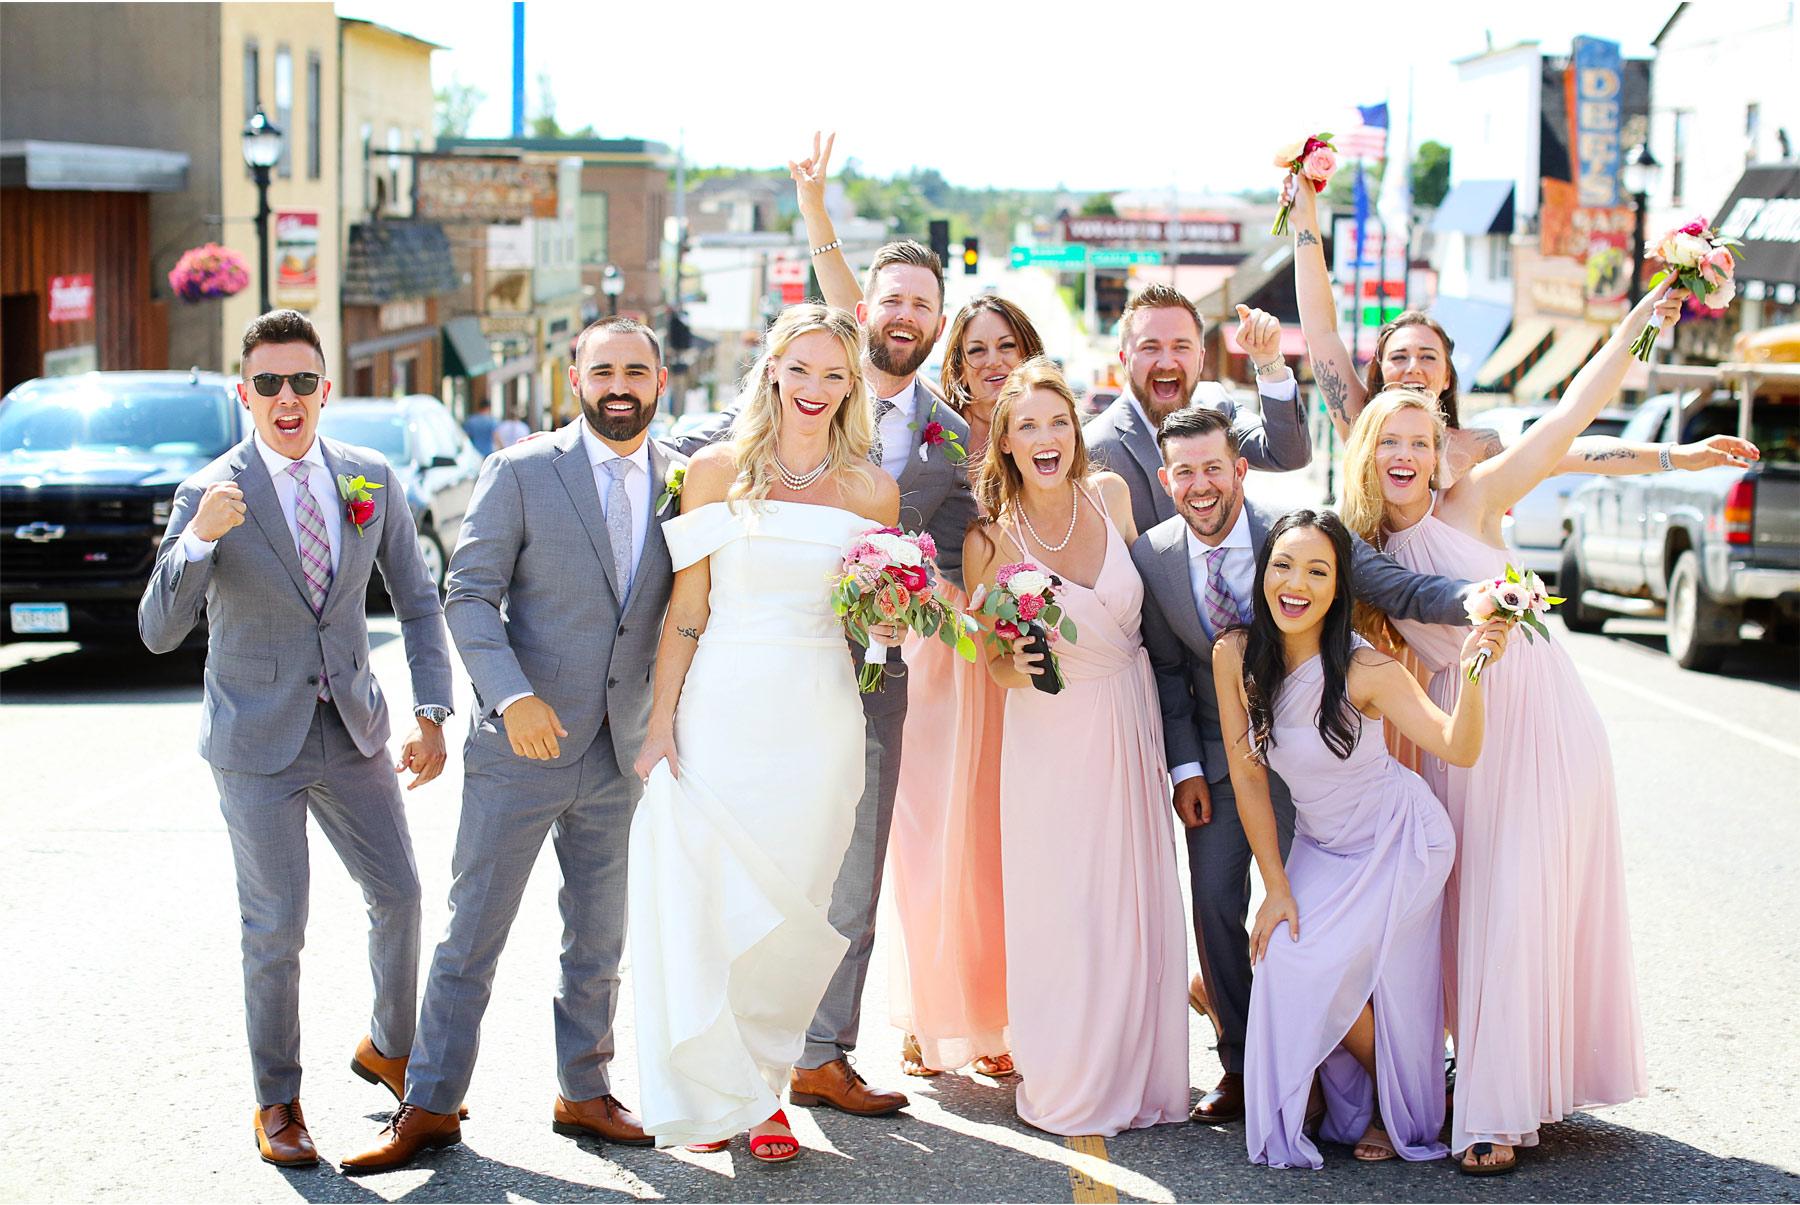 13-Ely-Minnesota-North-Wedding-by-Andrew-Vick-Photography-Bridesmaids-Groomsmen-Street-Katie-and-Joe.jpg